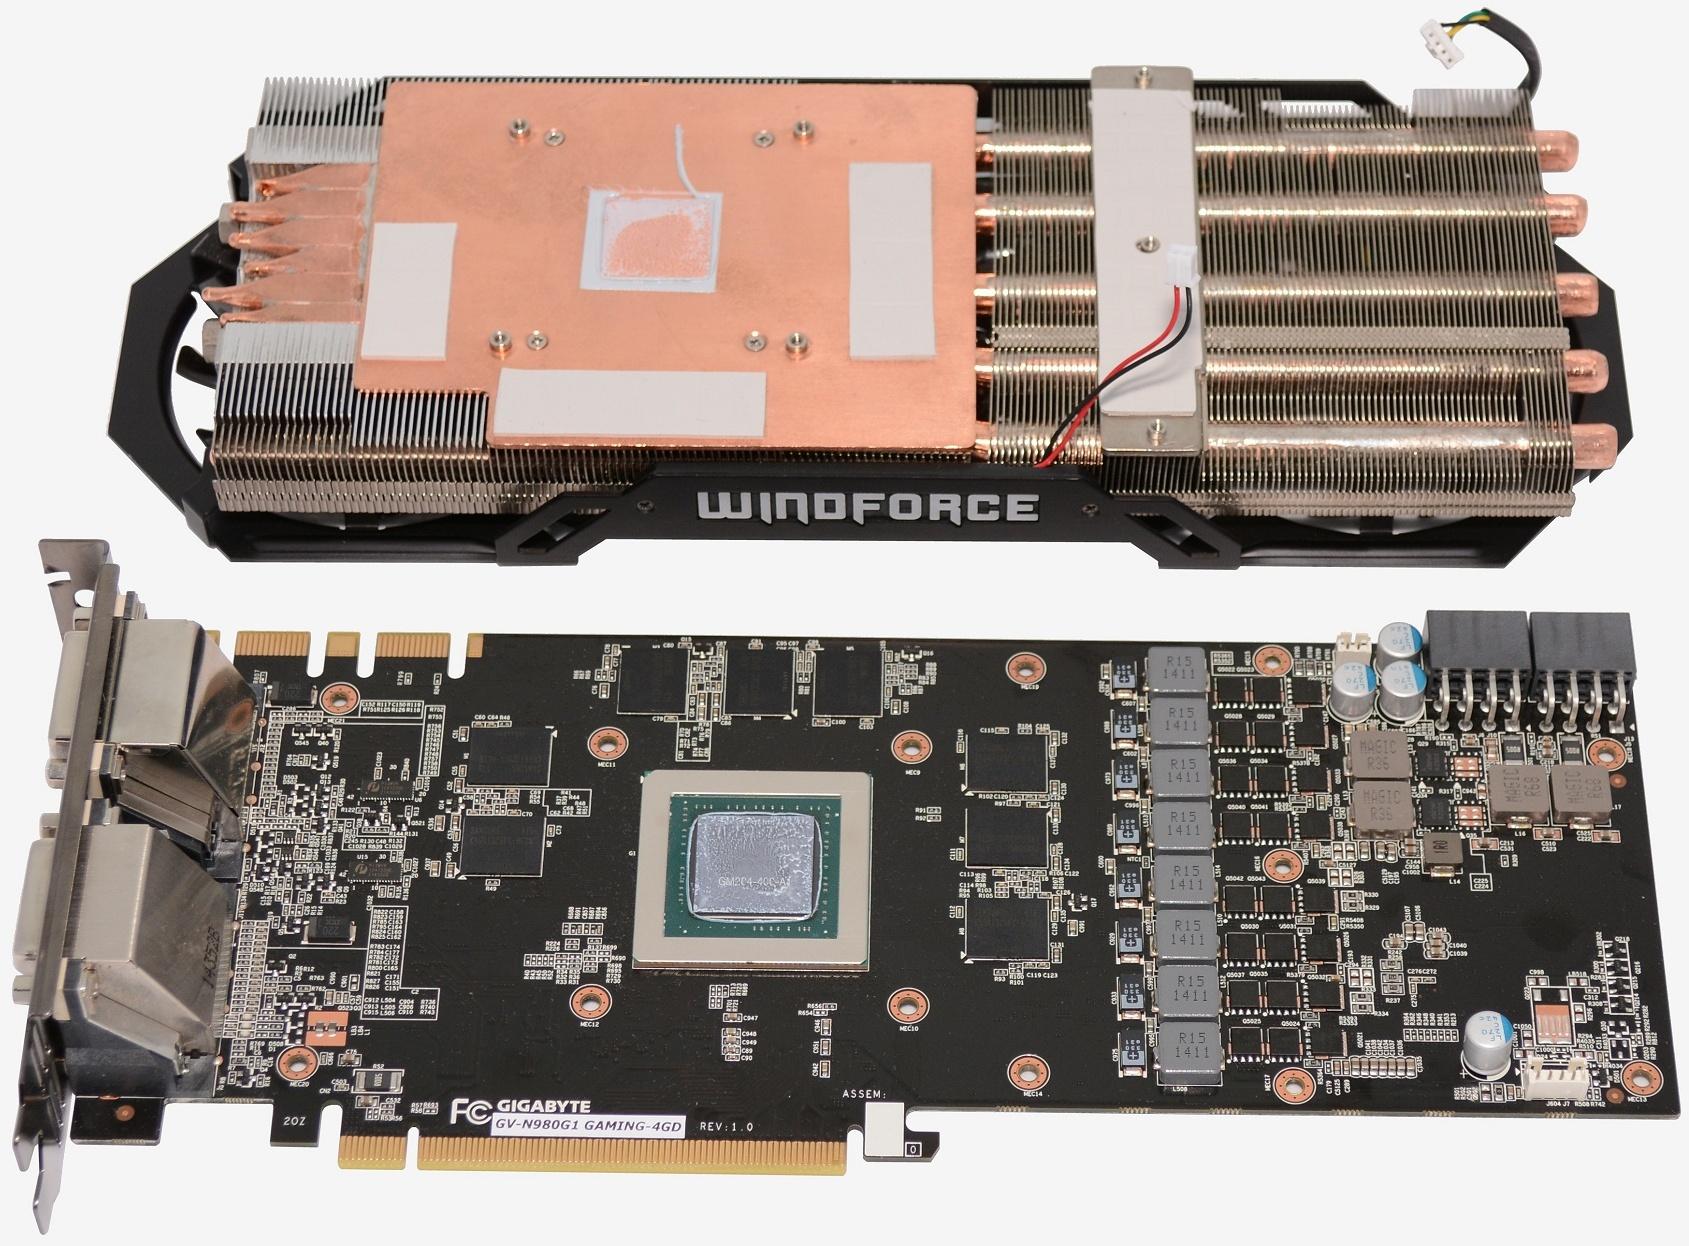 List of compatible water blocks | GIGABYTE GeForce GTX 980 Gaming G1